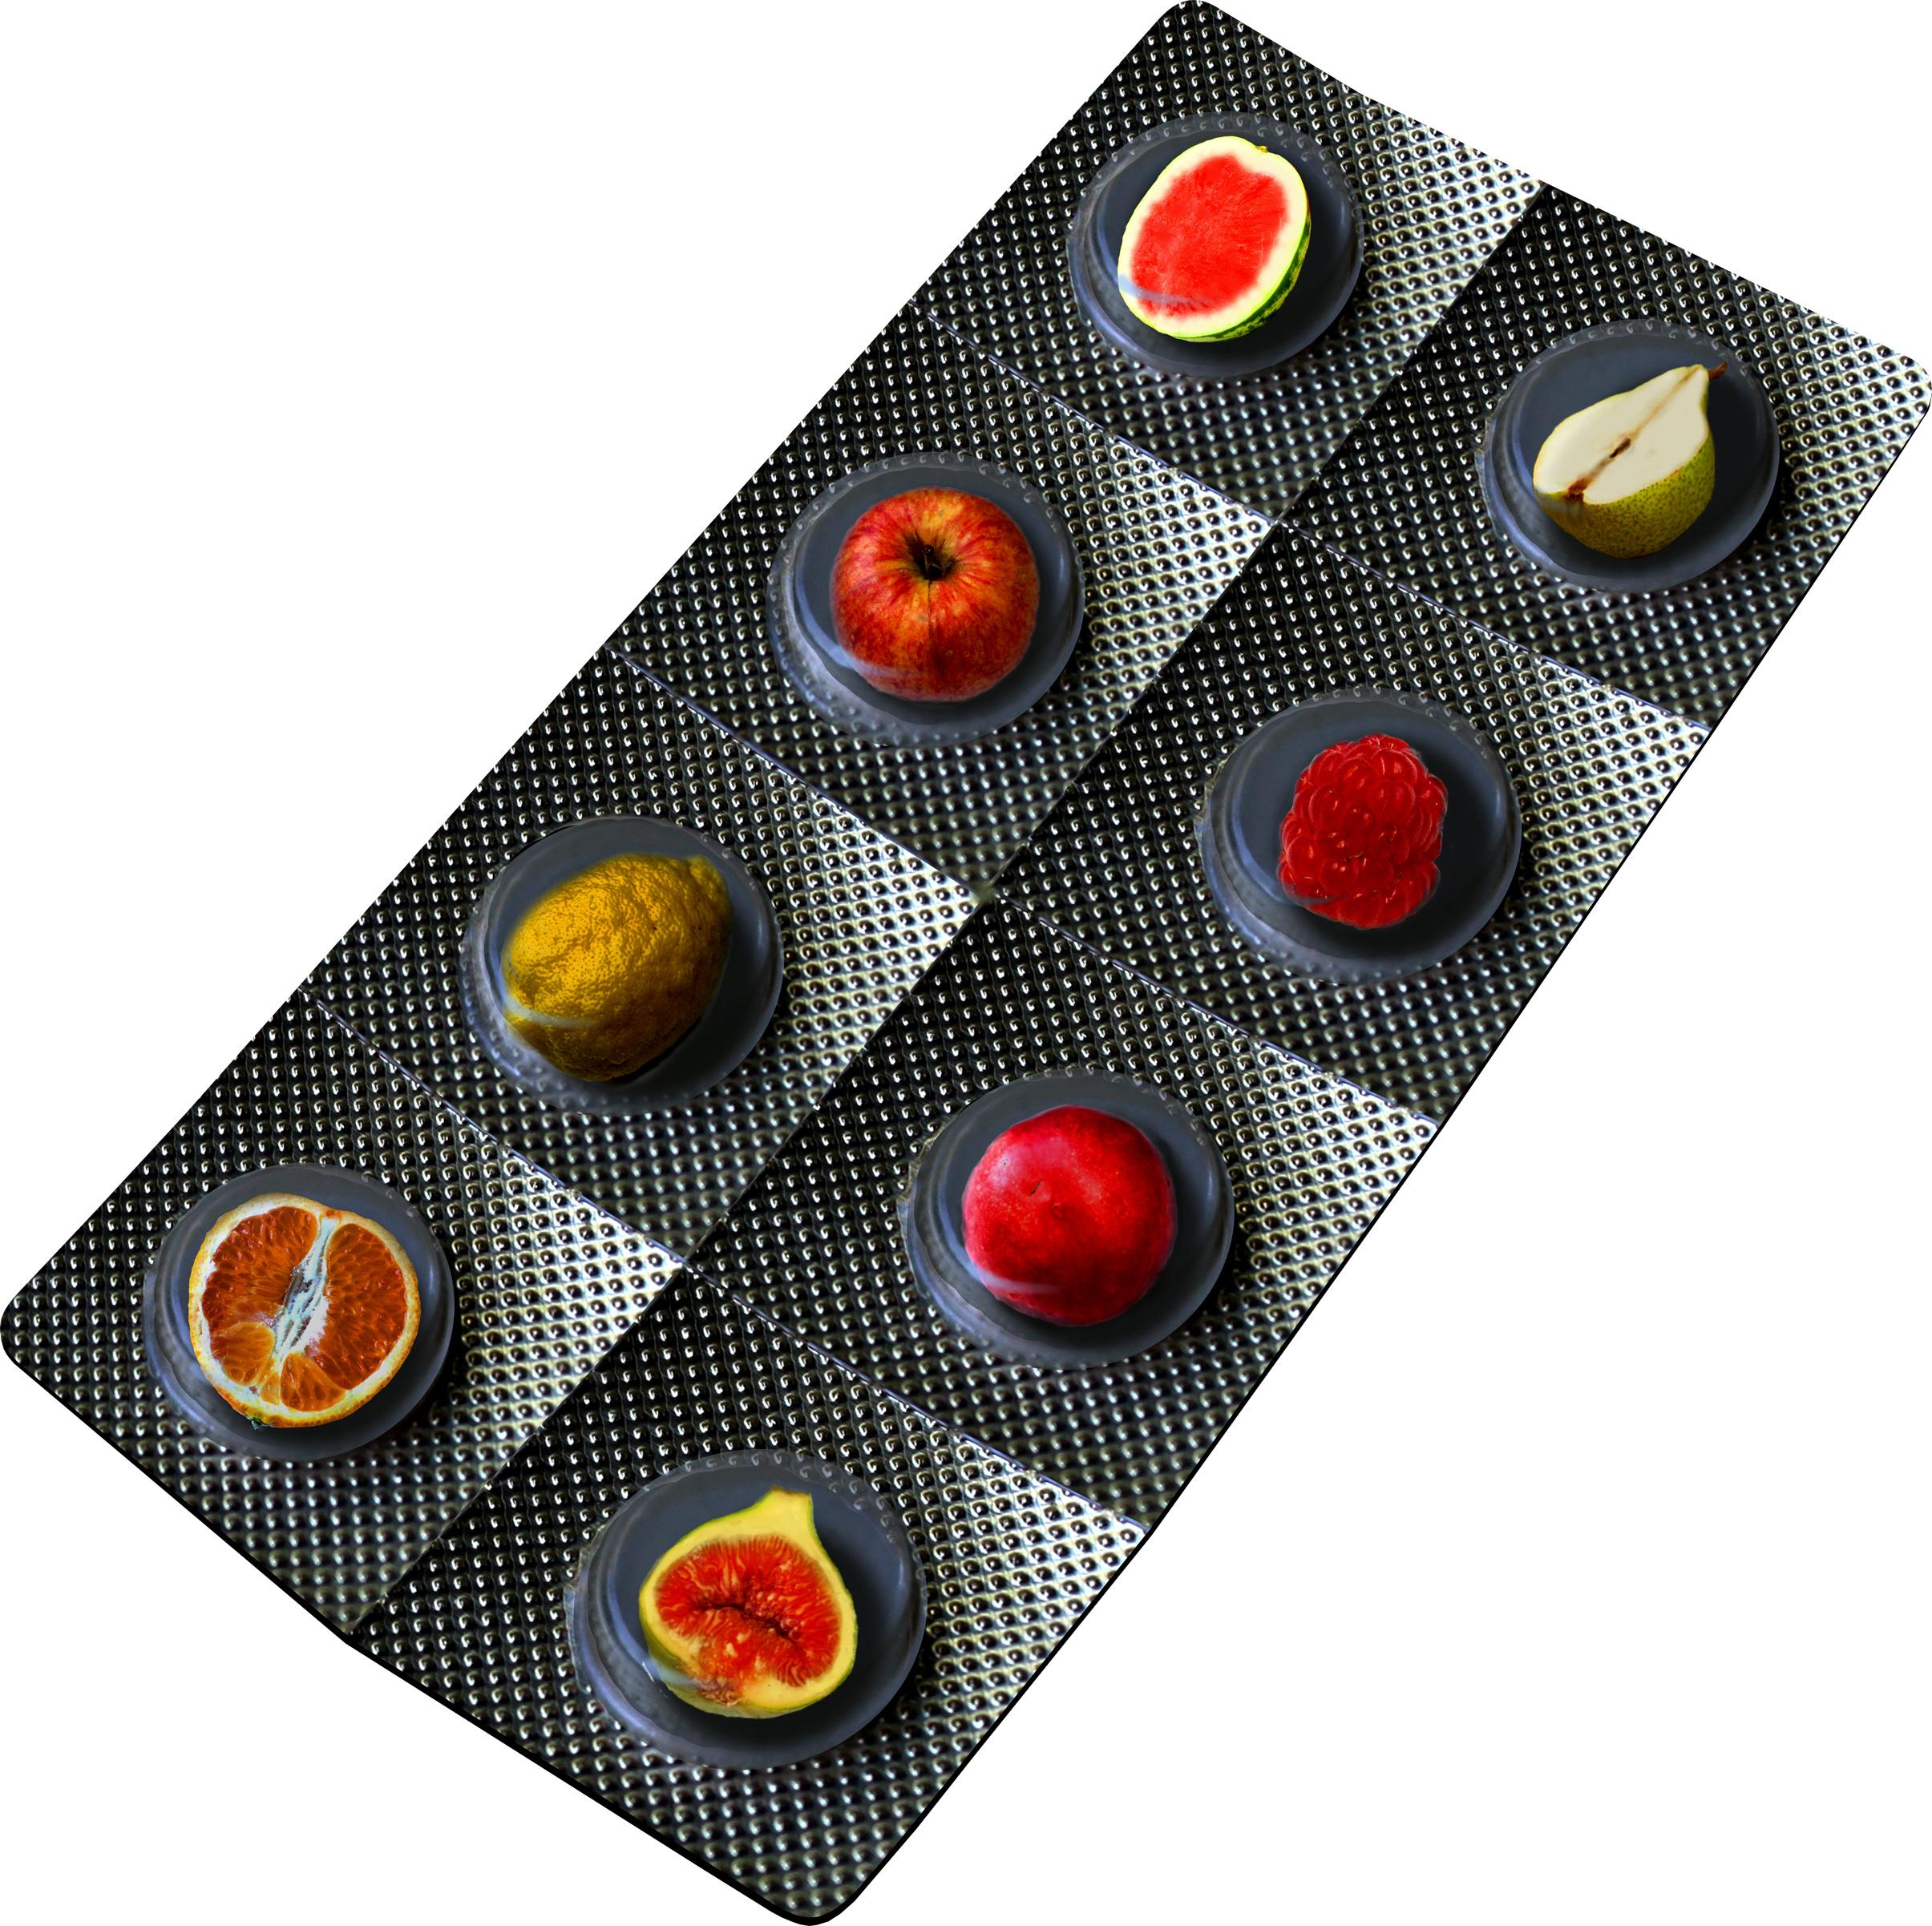 Fruit Vitamins as Pills, Pills, Pill, Pharmacy, Plant, HQ Photo